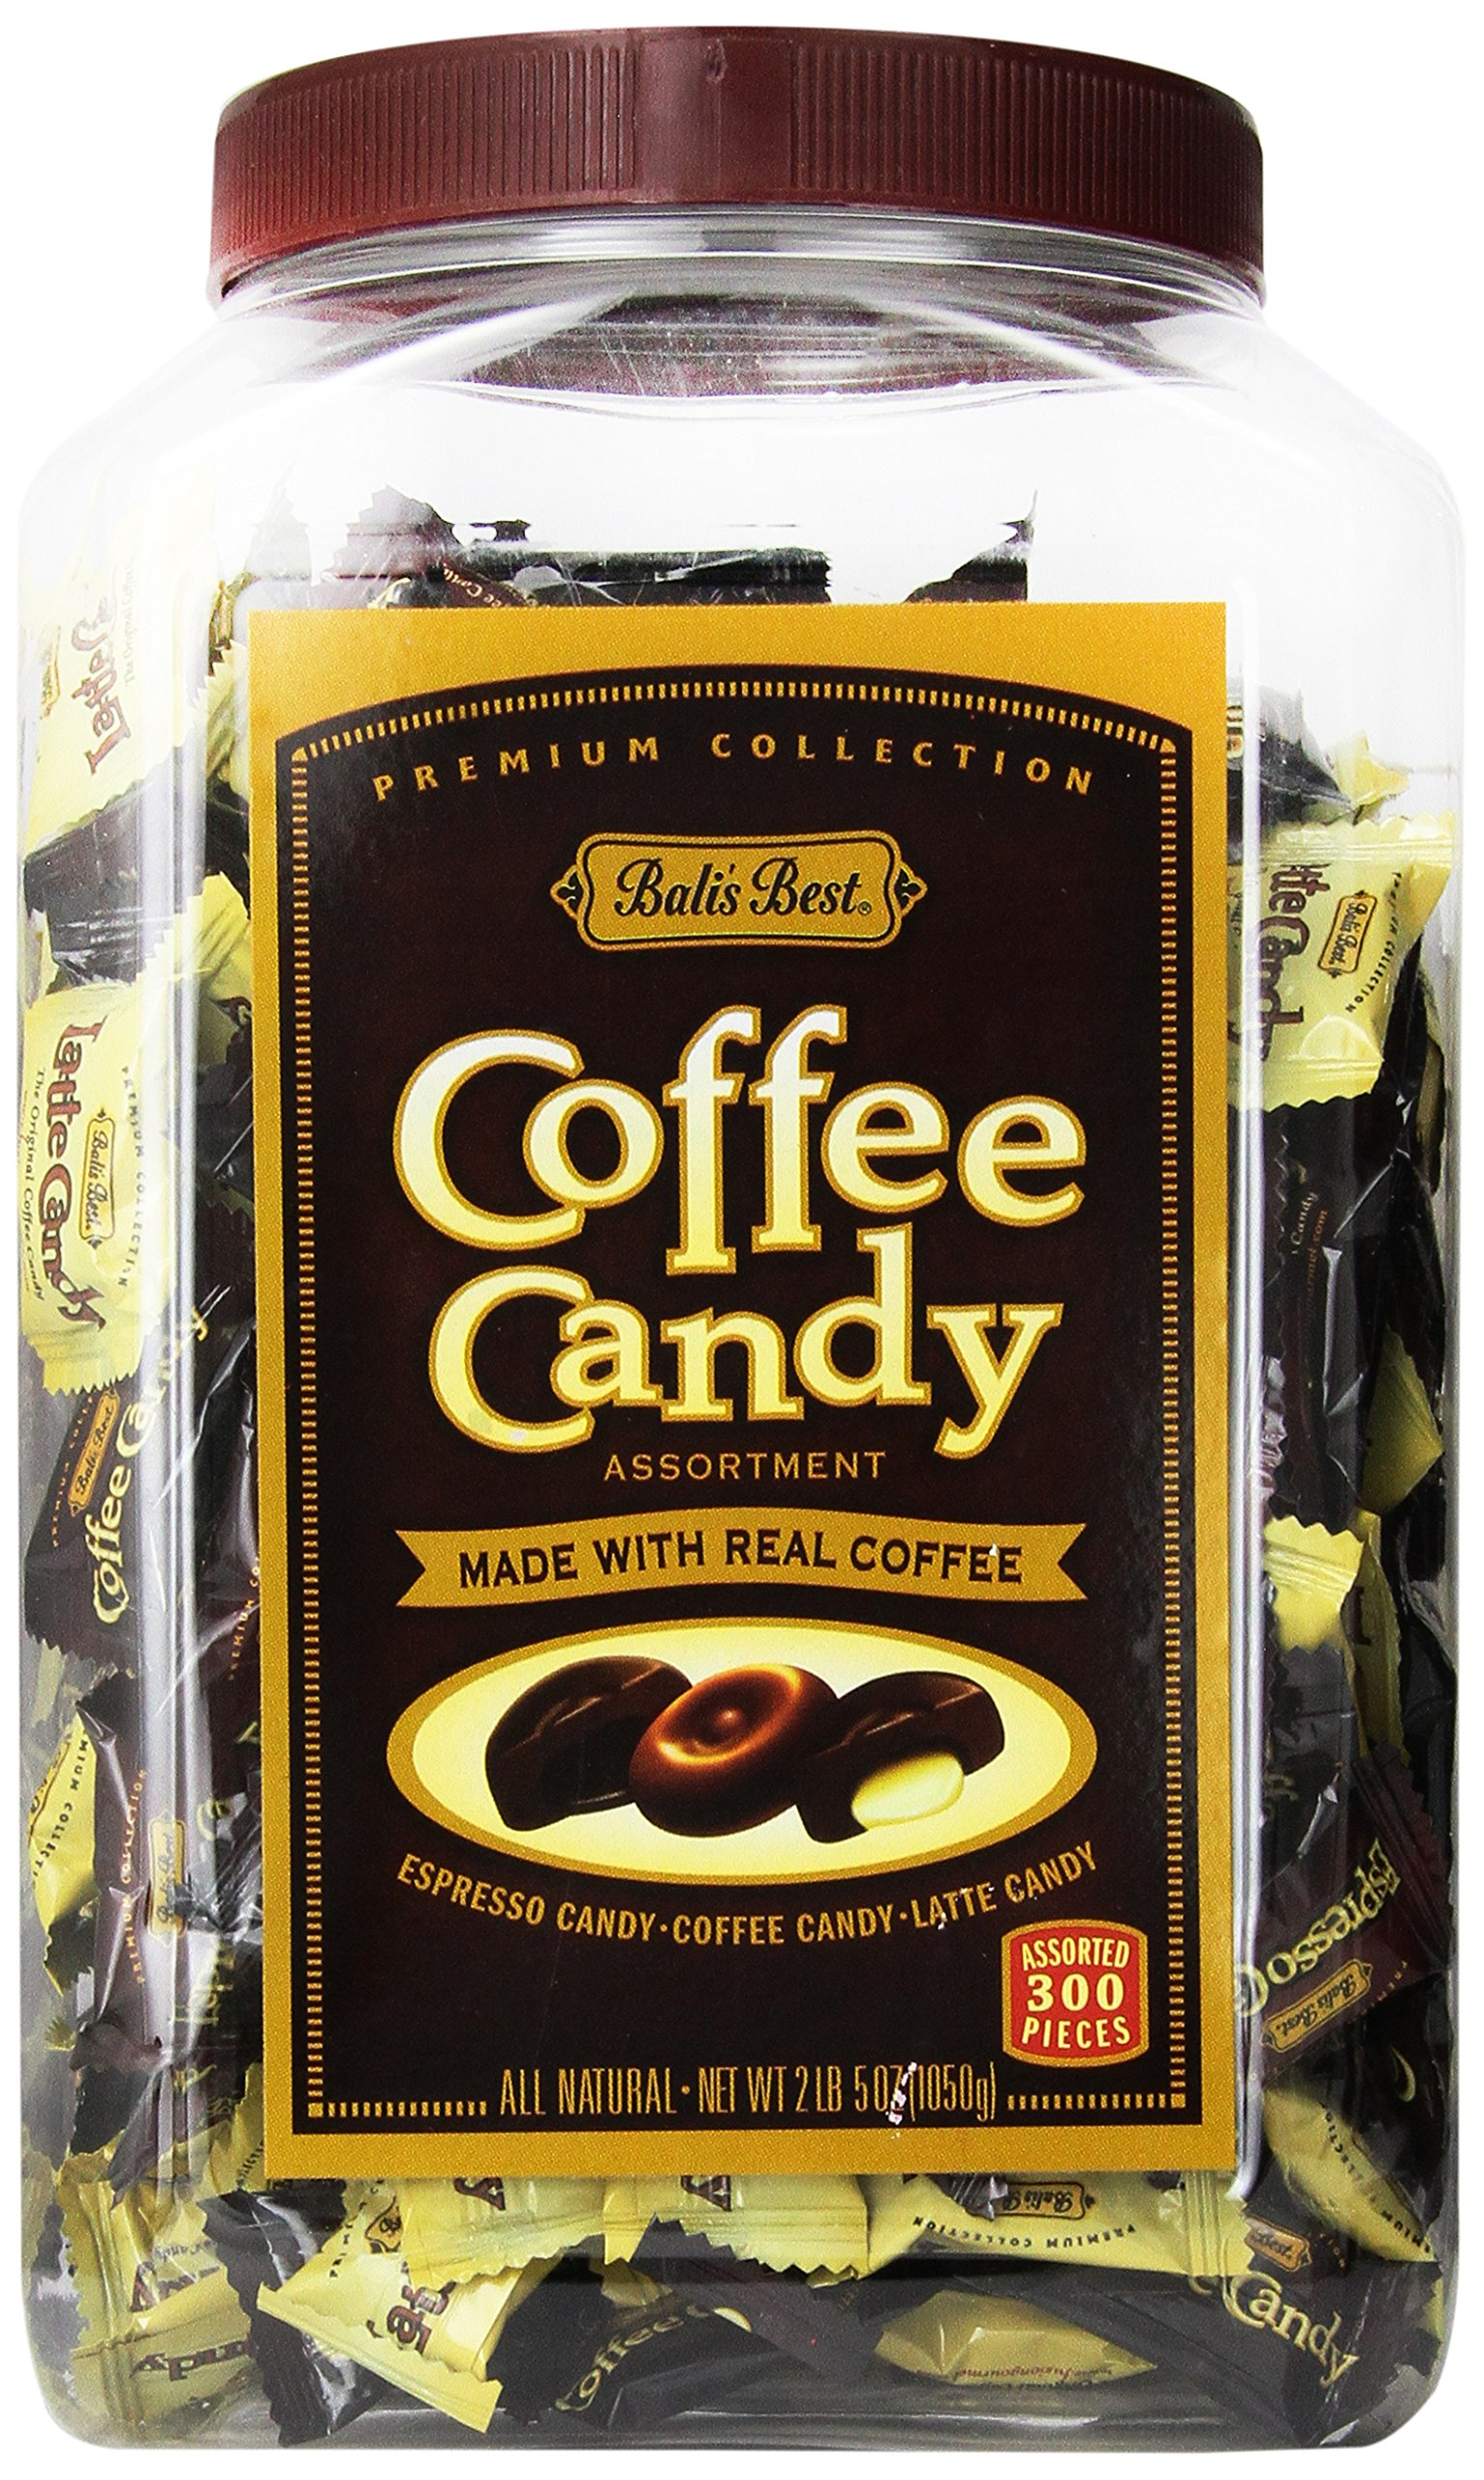 Bali's Best Assorted Coffee Candy Jar - 2lb 5oz by Bali's Best